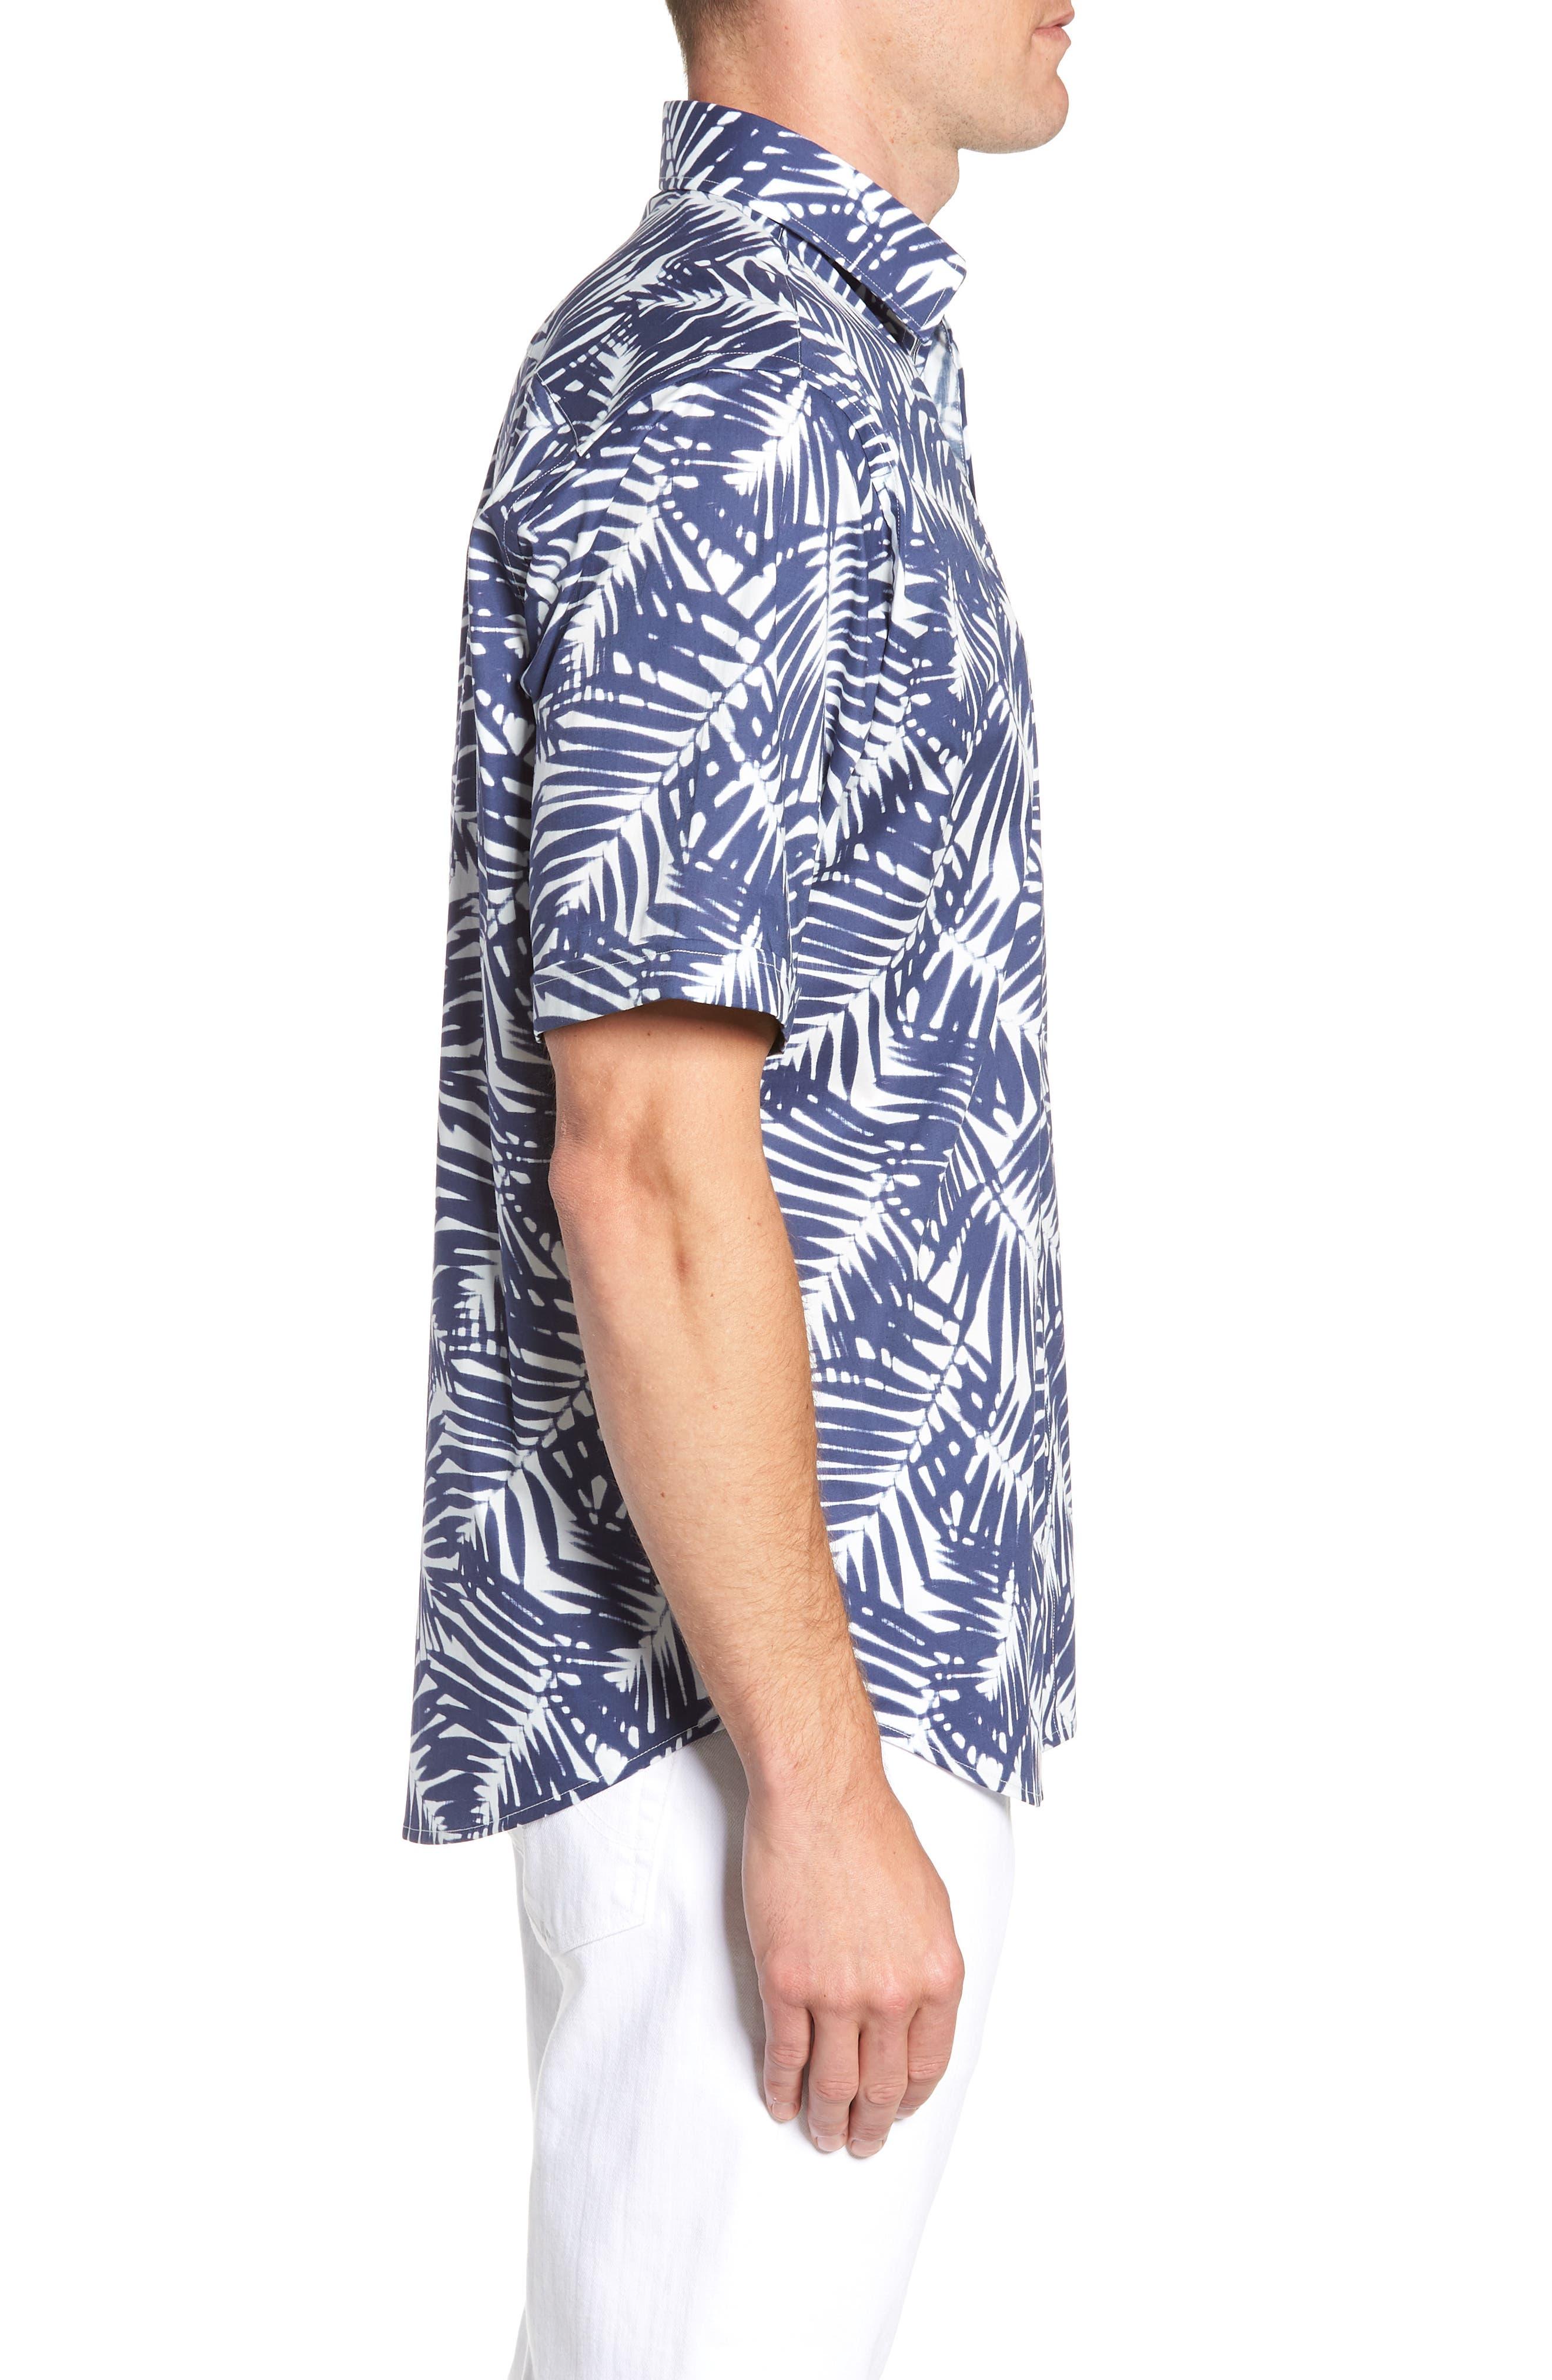 Indigo Palms Classic Fit Sport Shirt,                             Alternate thumbnail 3, color,                             Navy